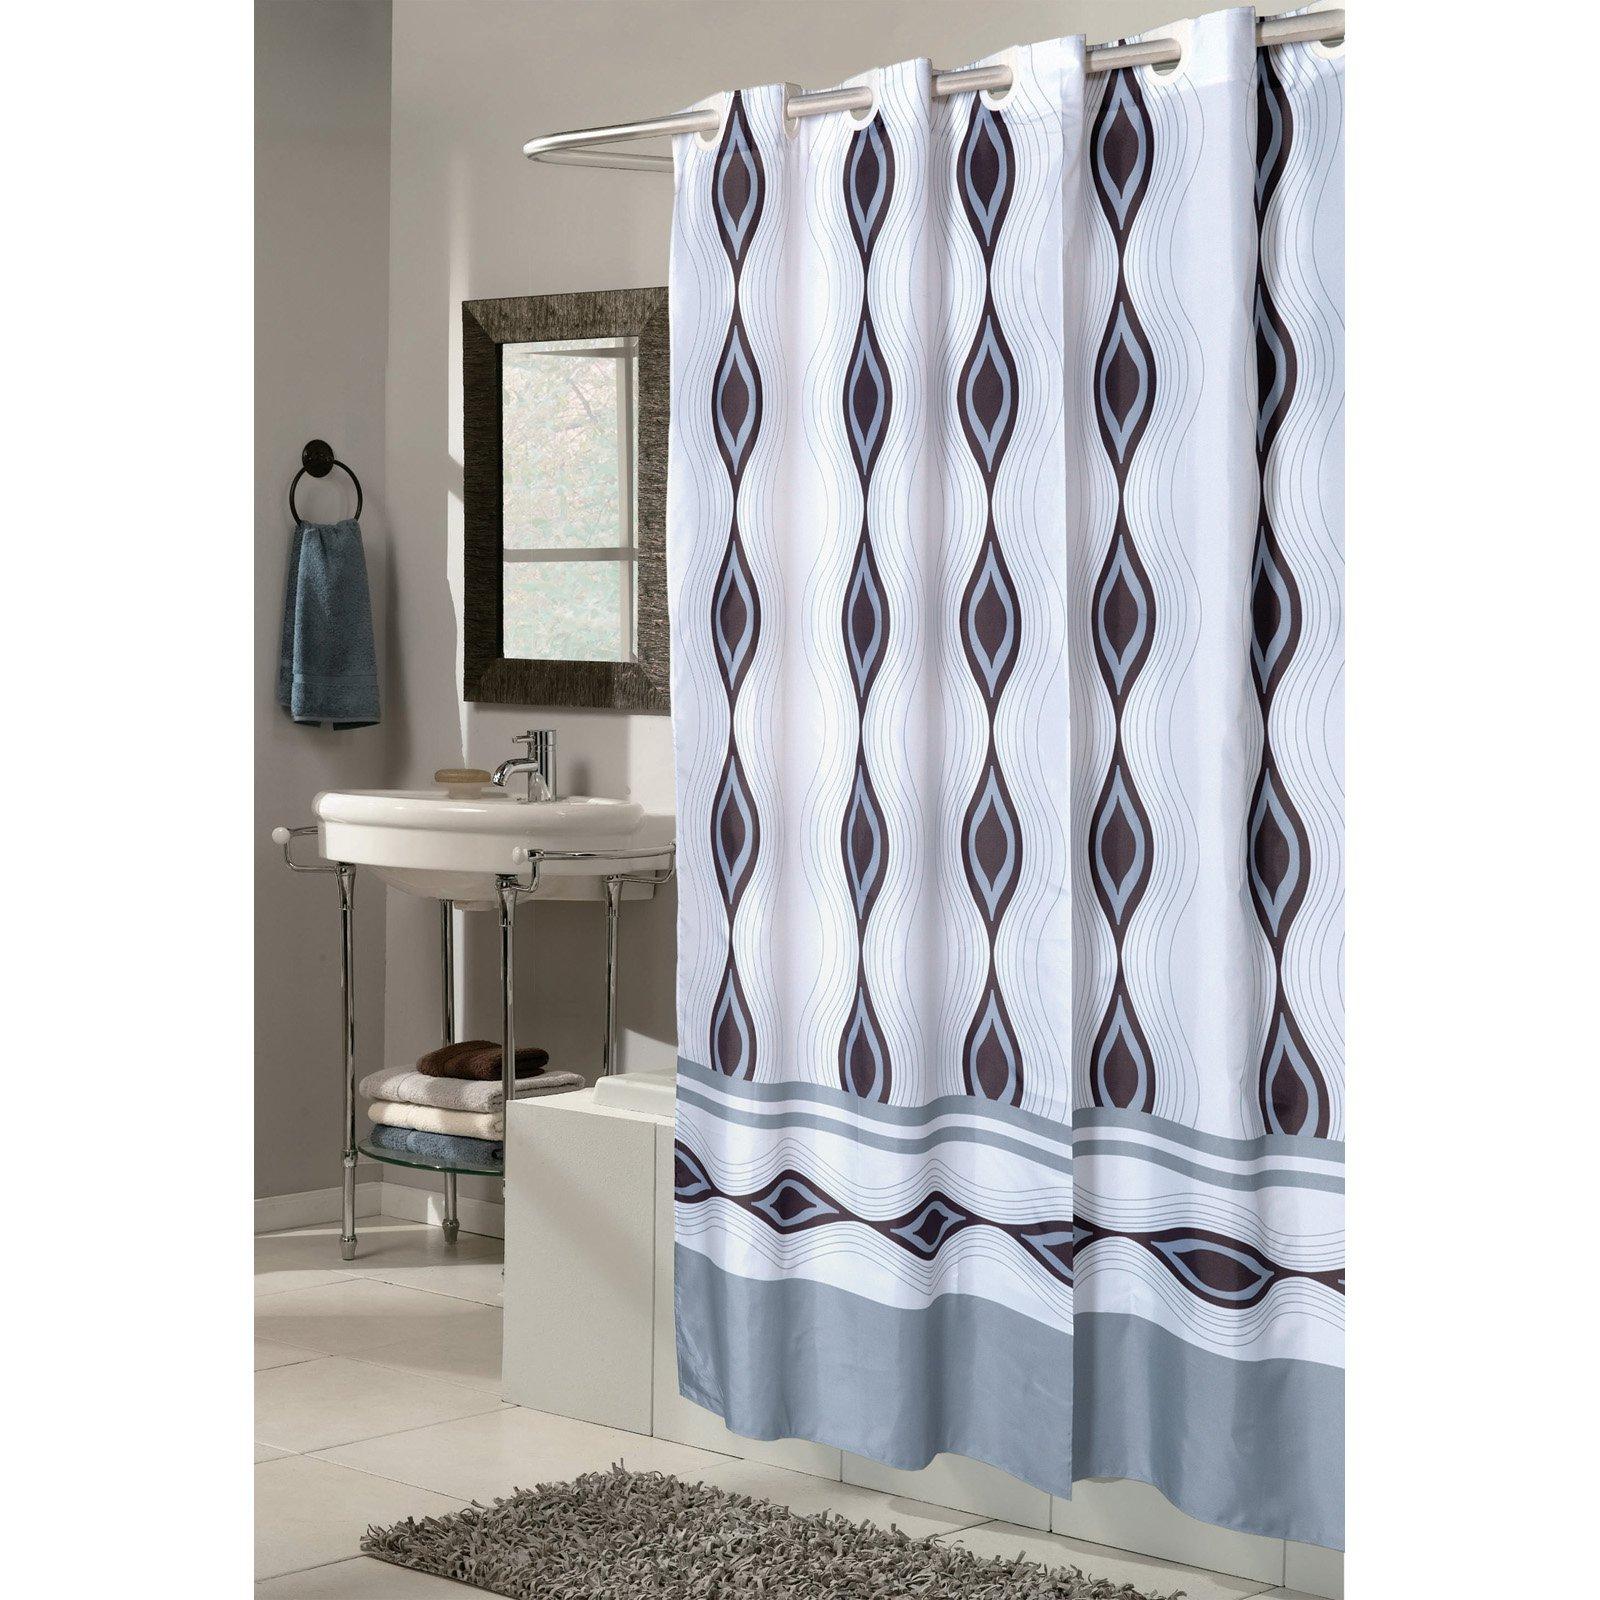 Ben and Jonah EZ-ON  Harlequin Shower Curtain